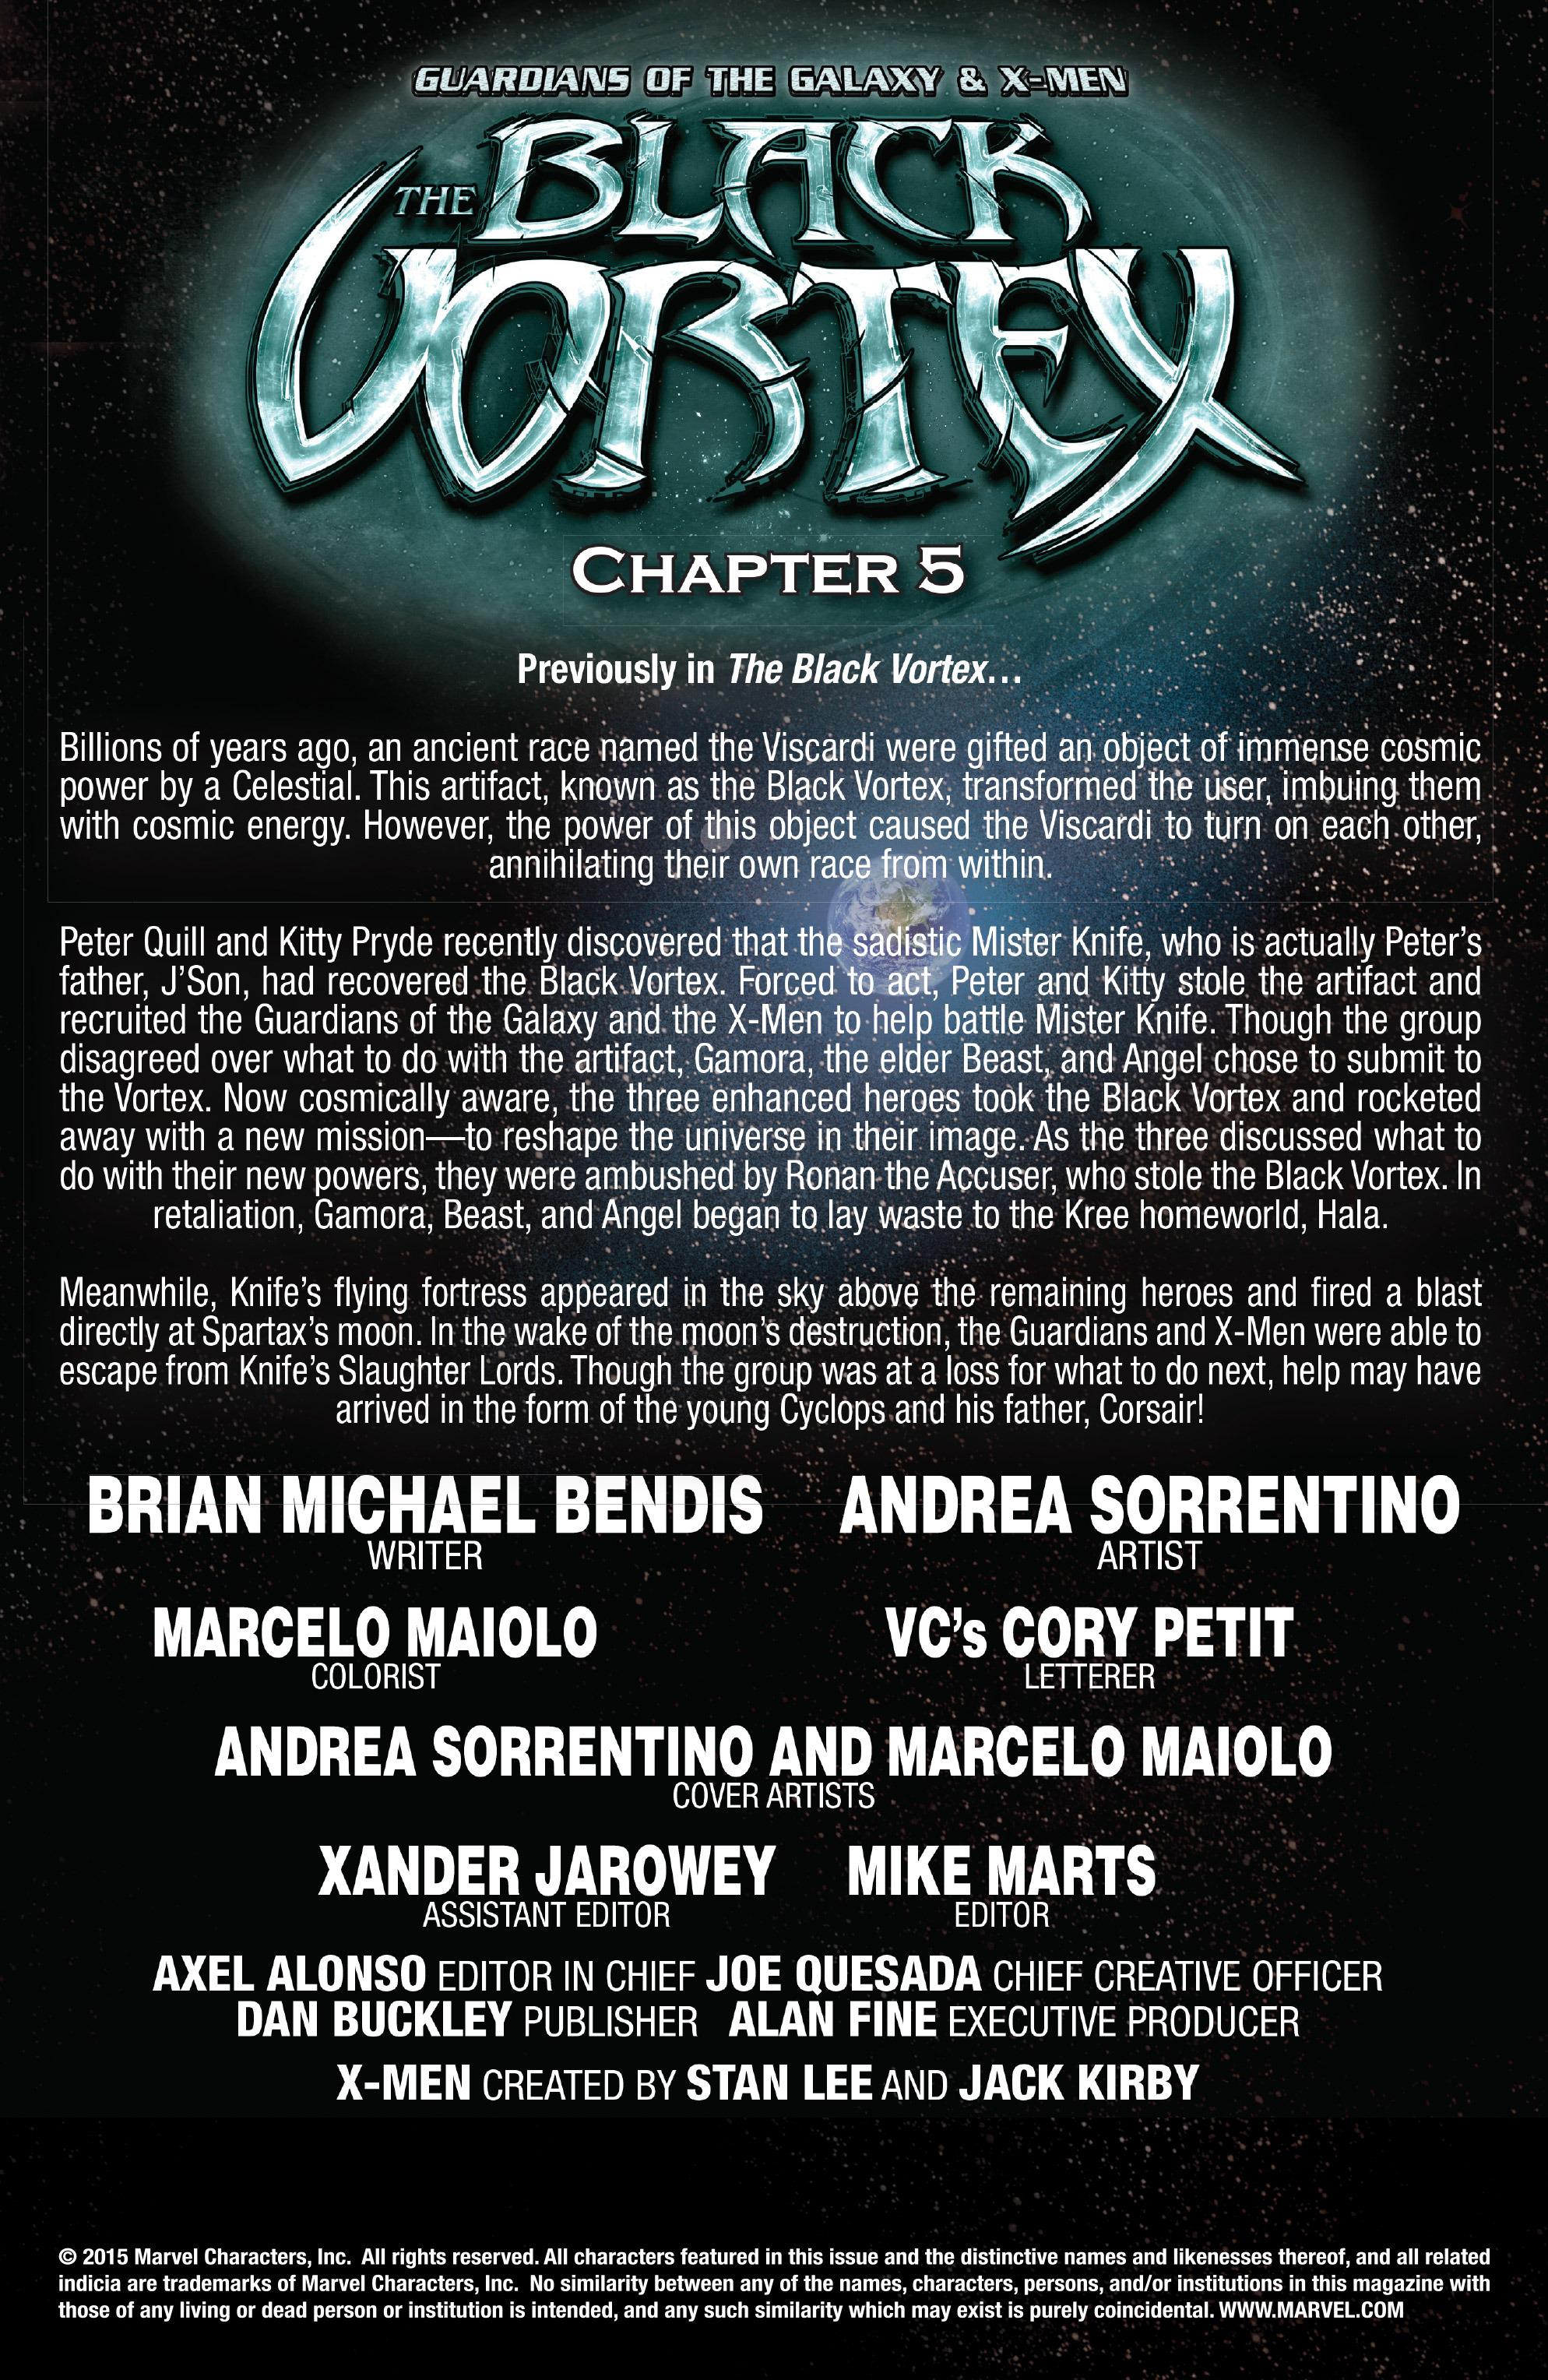 All-New X-Men (2013) chap 39 pic 2